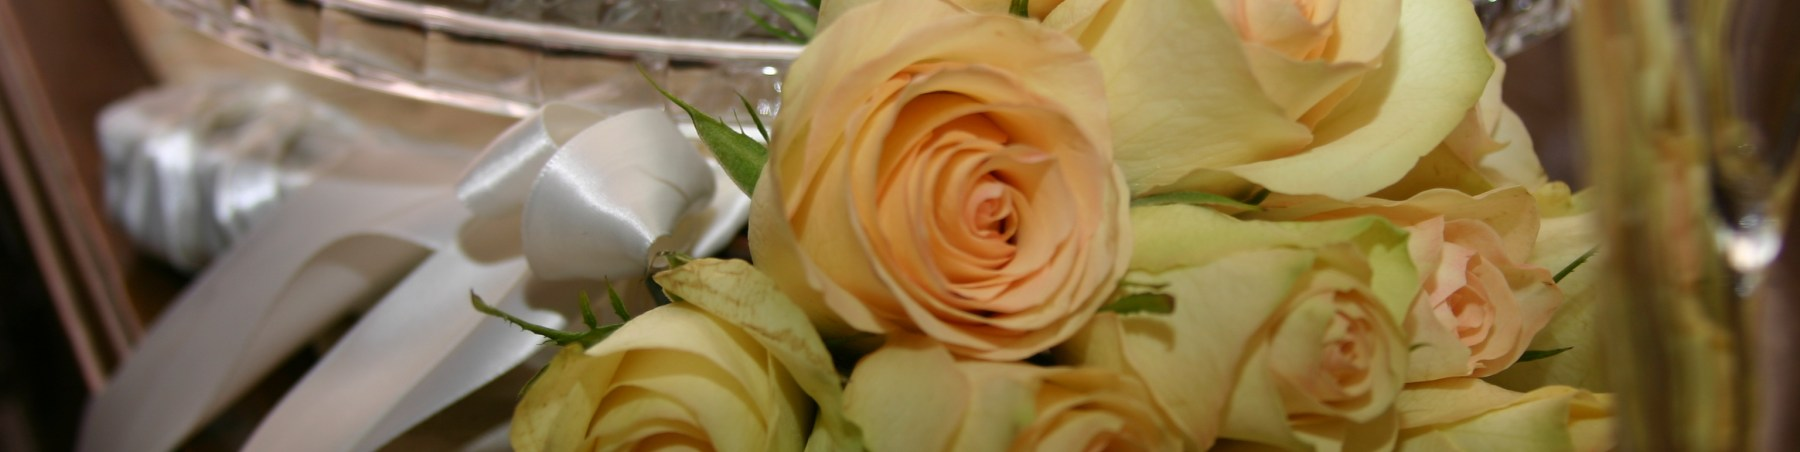 roses452